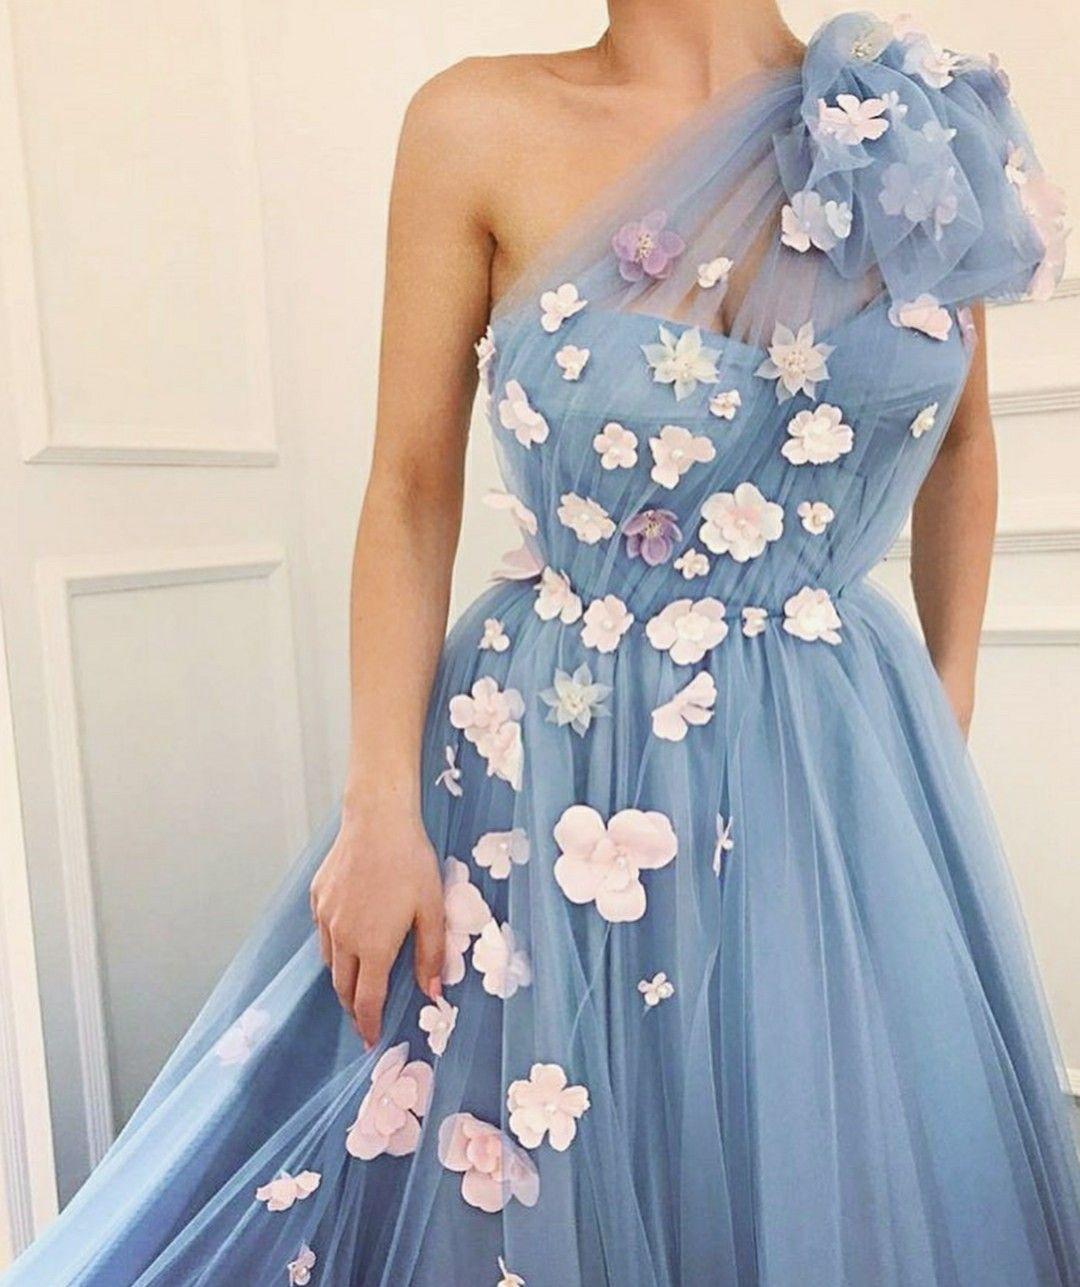 Dorable Silver Party Dresses Elaboration - All Wedding Dresses ...